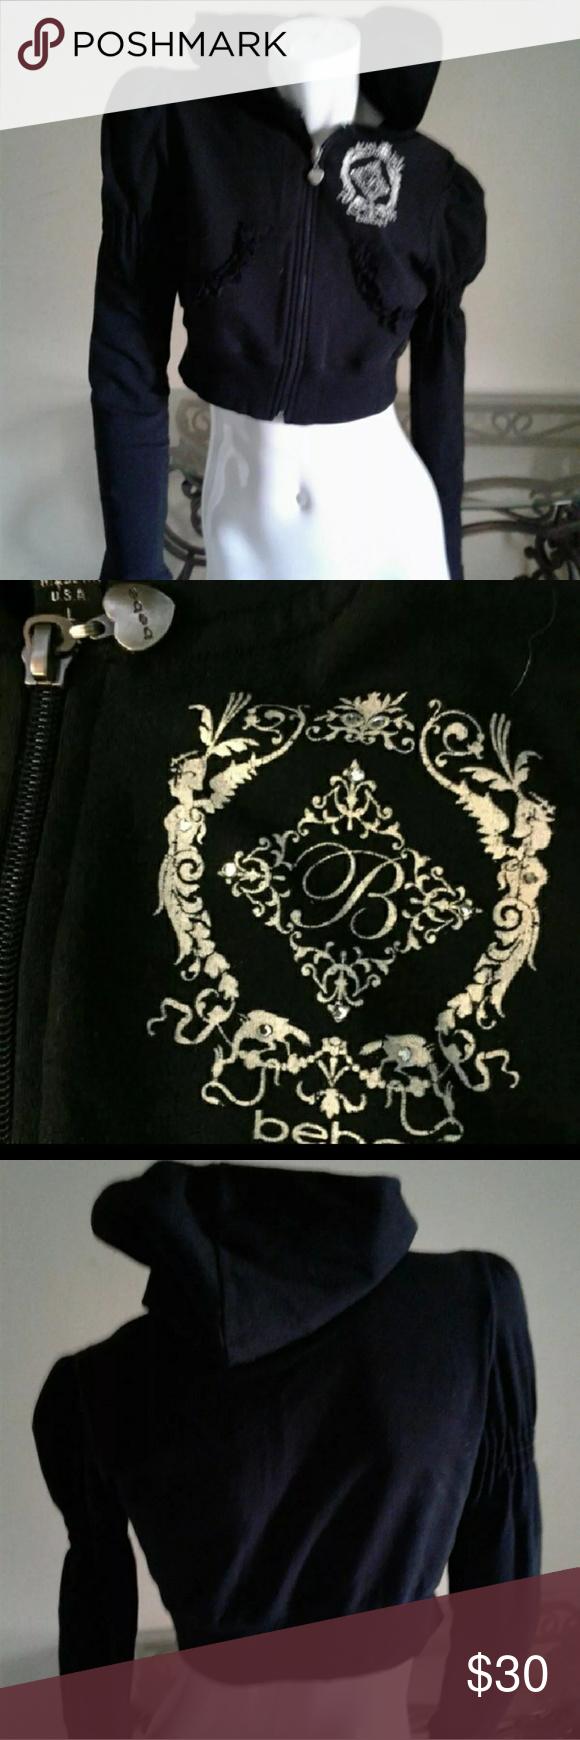 💕BEBE crop top💕 Black hoody with gold hardware & scrunchy